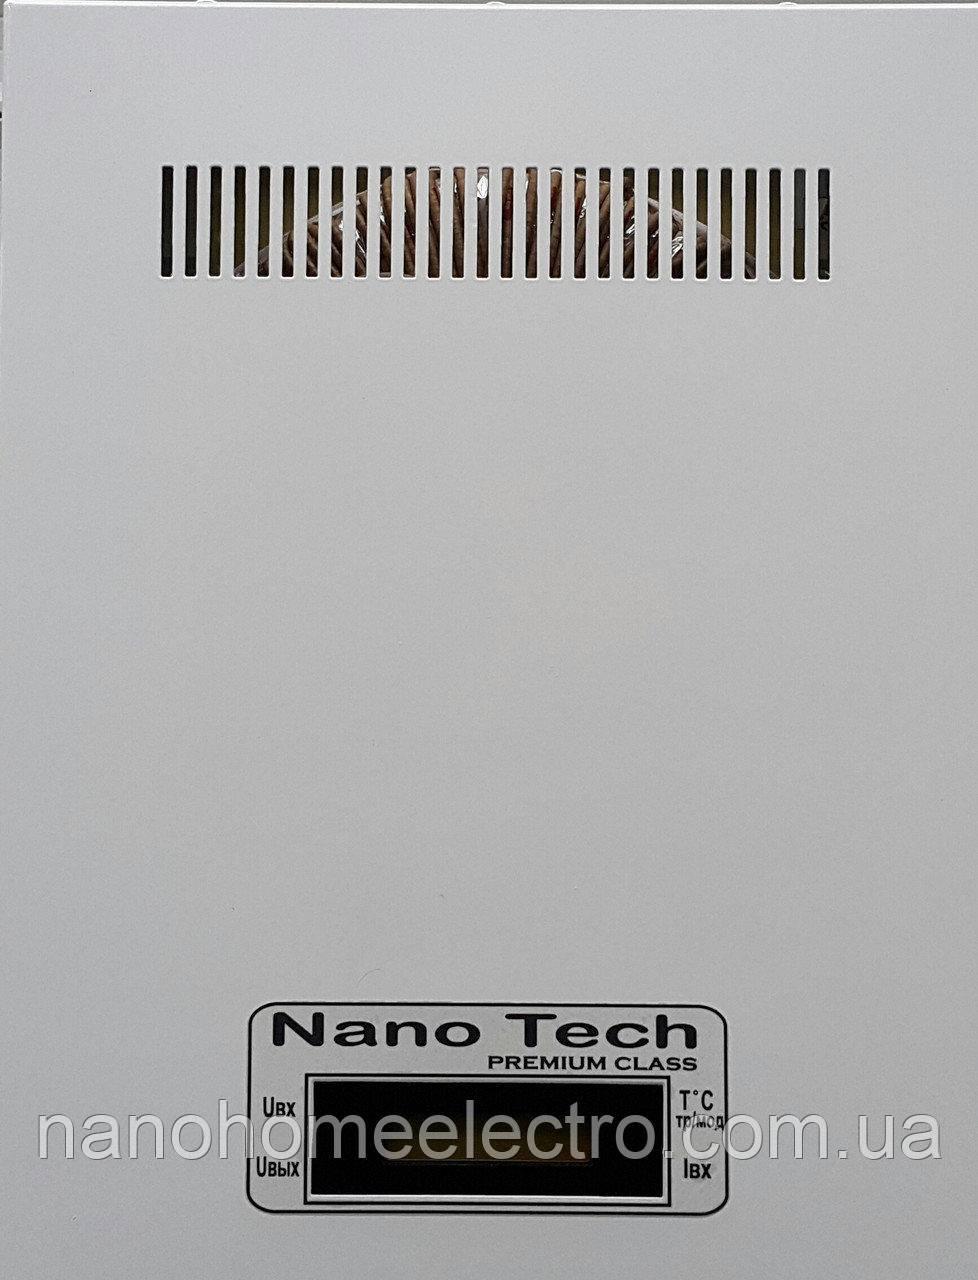 Стабилизатор напряжения 12 квт PRO Премиум NanoTech